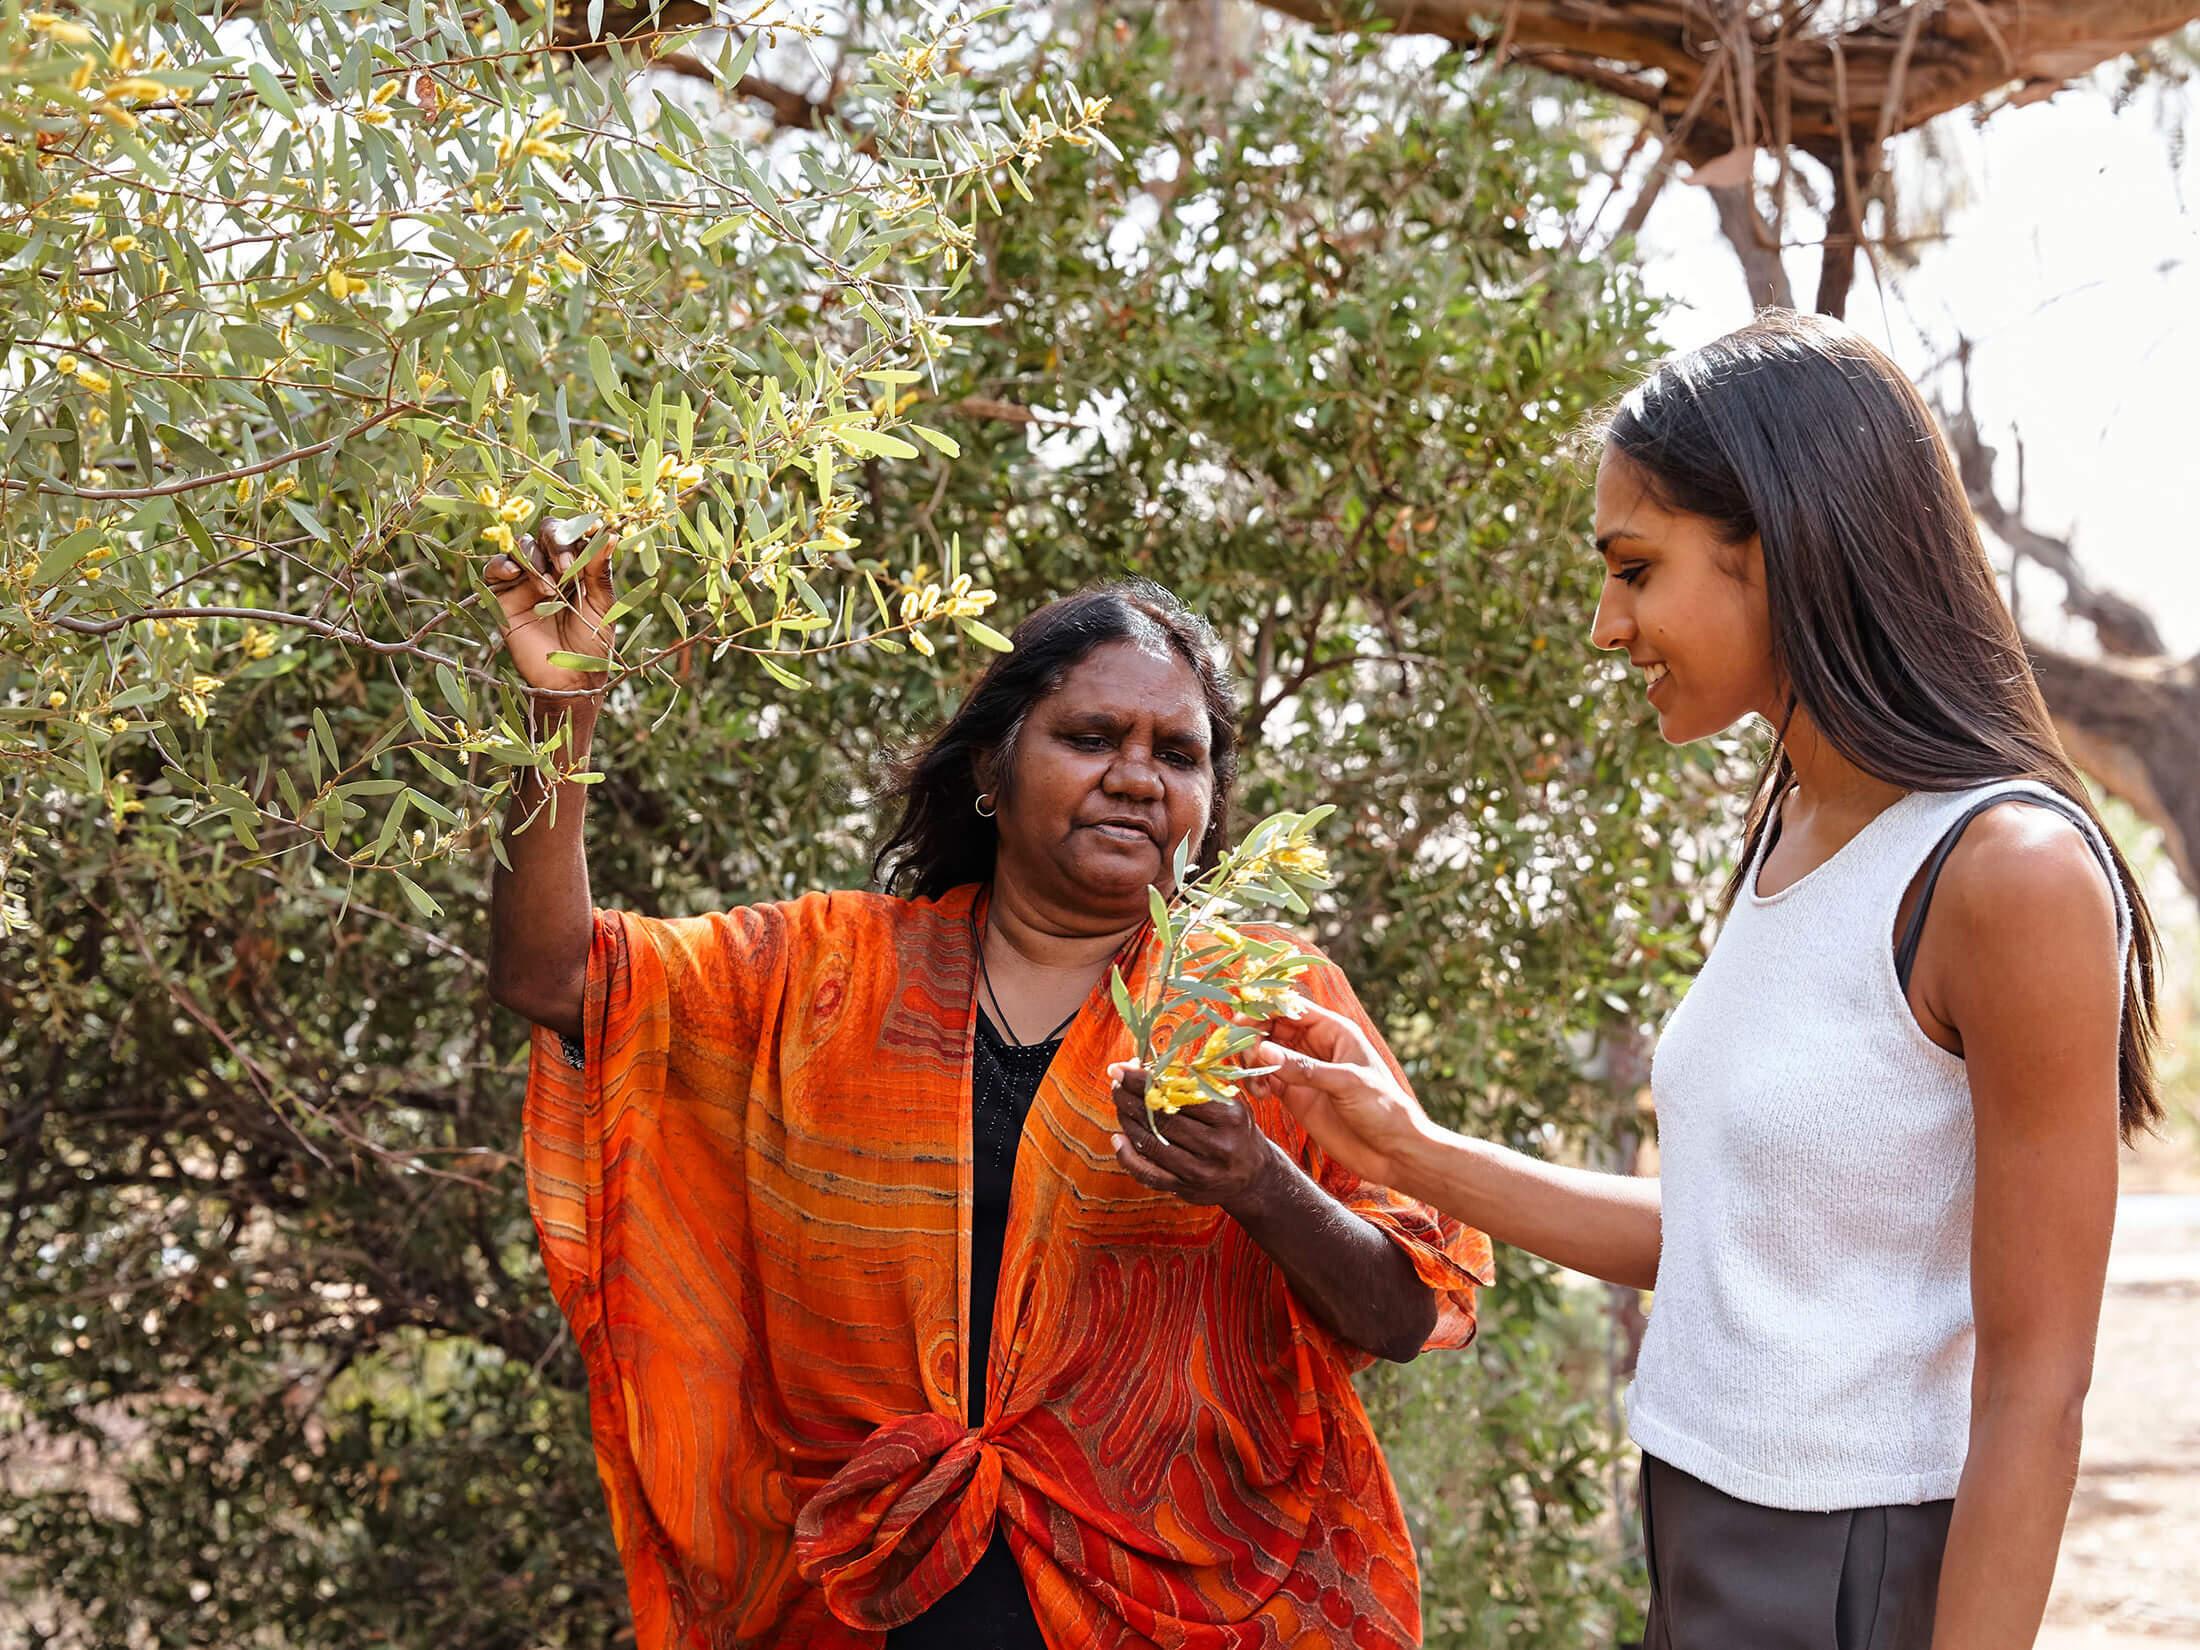 two women study a plant